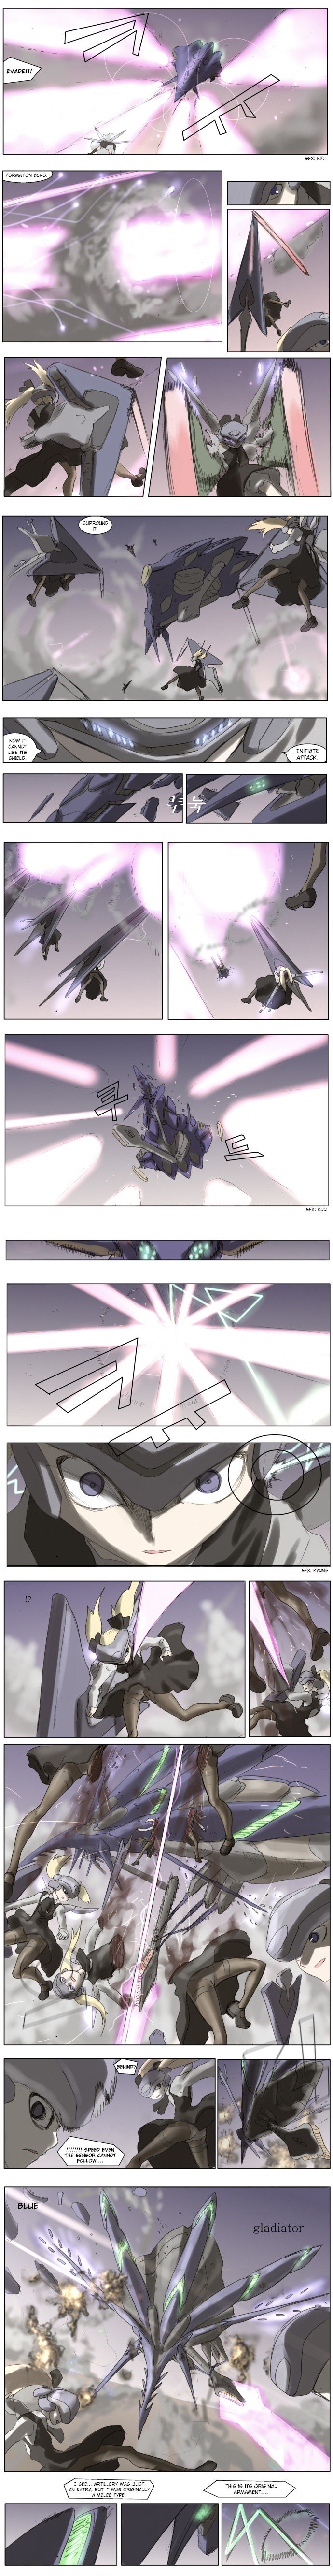 Knight Run 57 Page 3